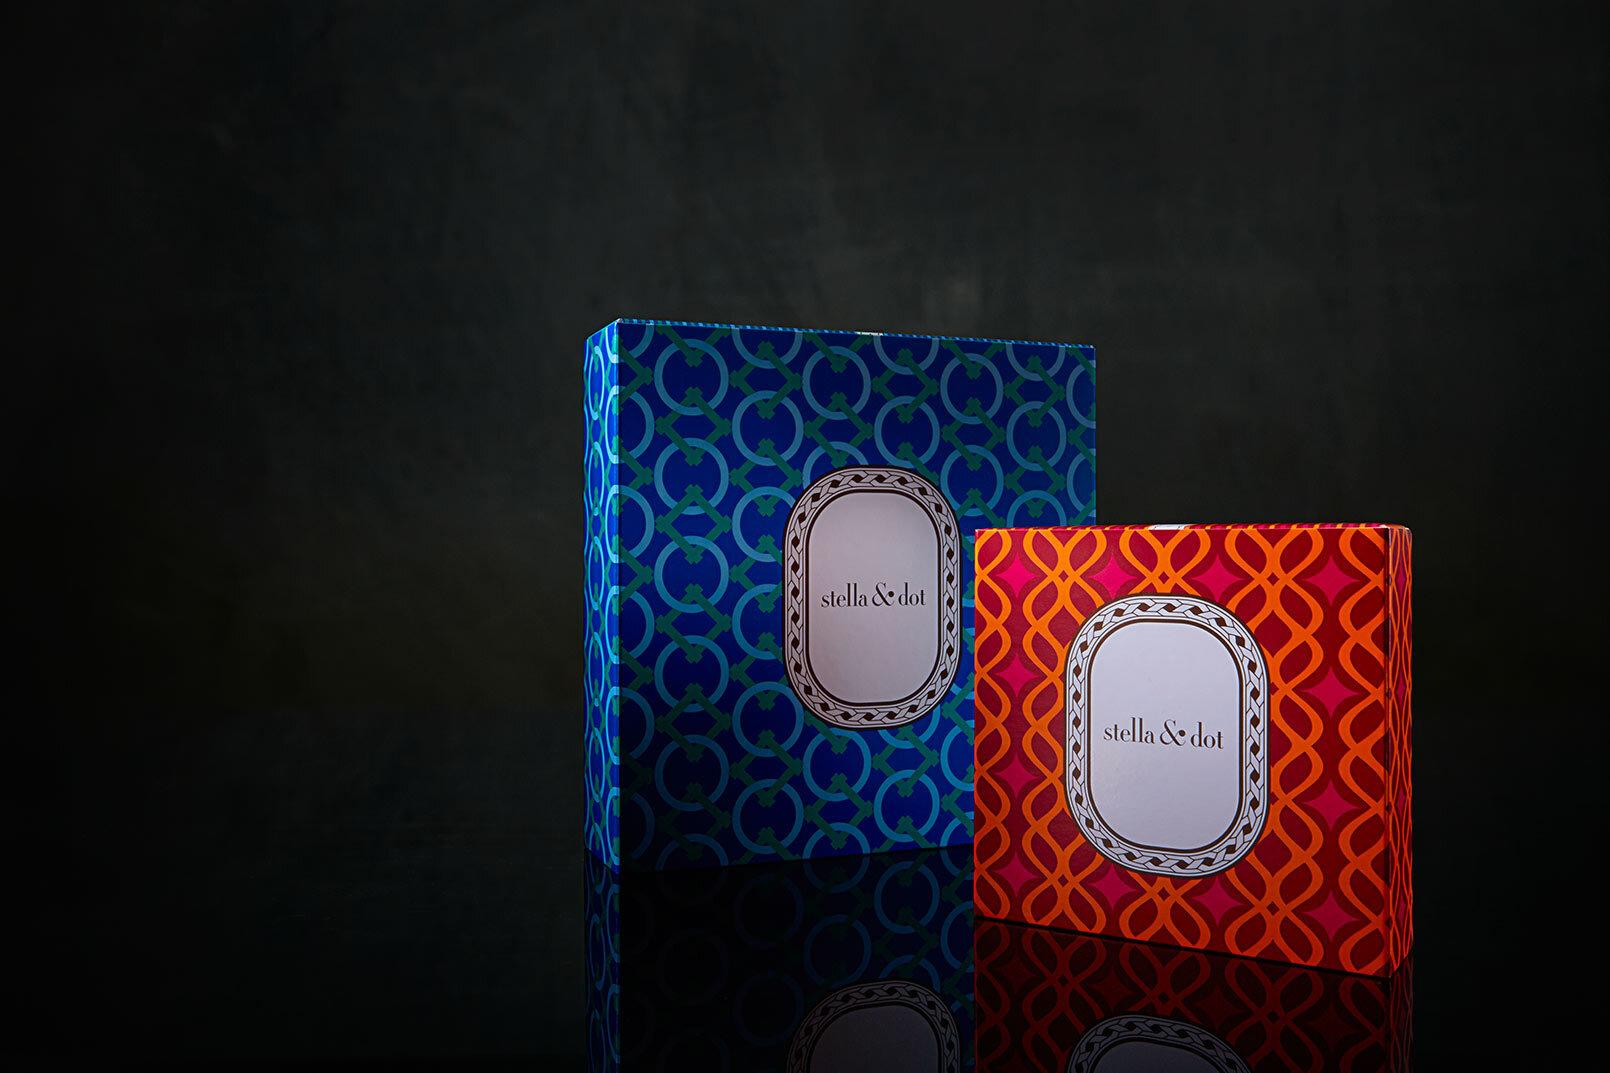 Stella-and-Dot-Jewelry-Box-Design-Packaging-Company-1.jpg